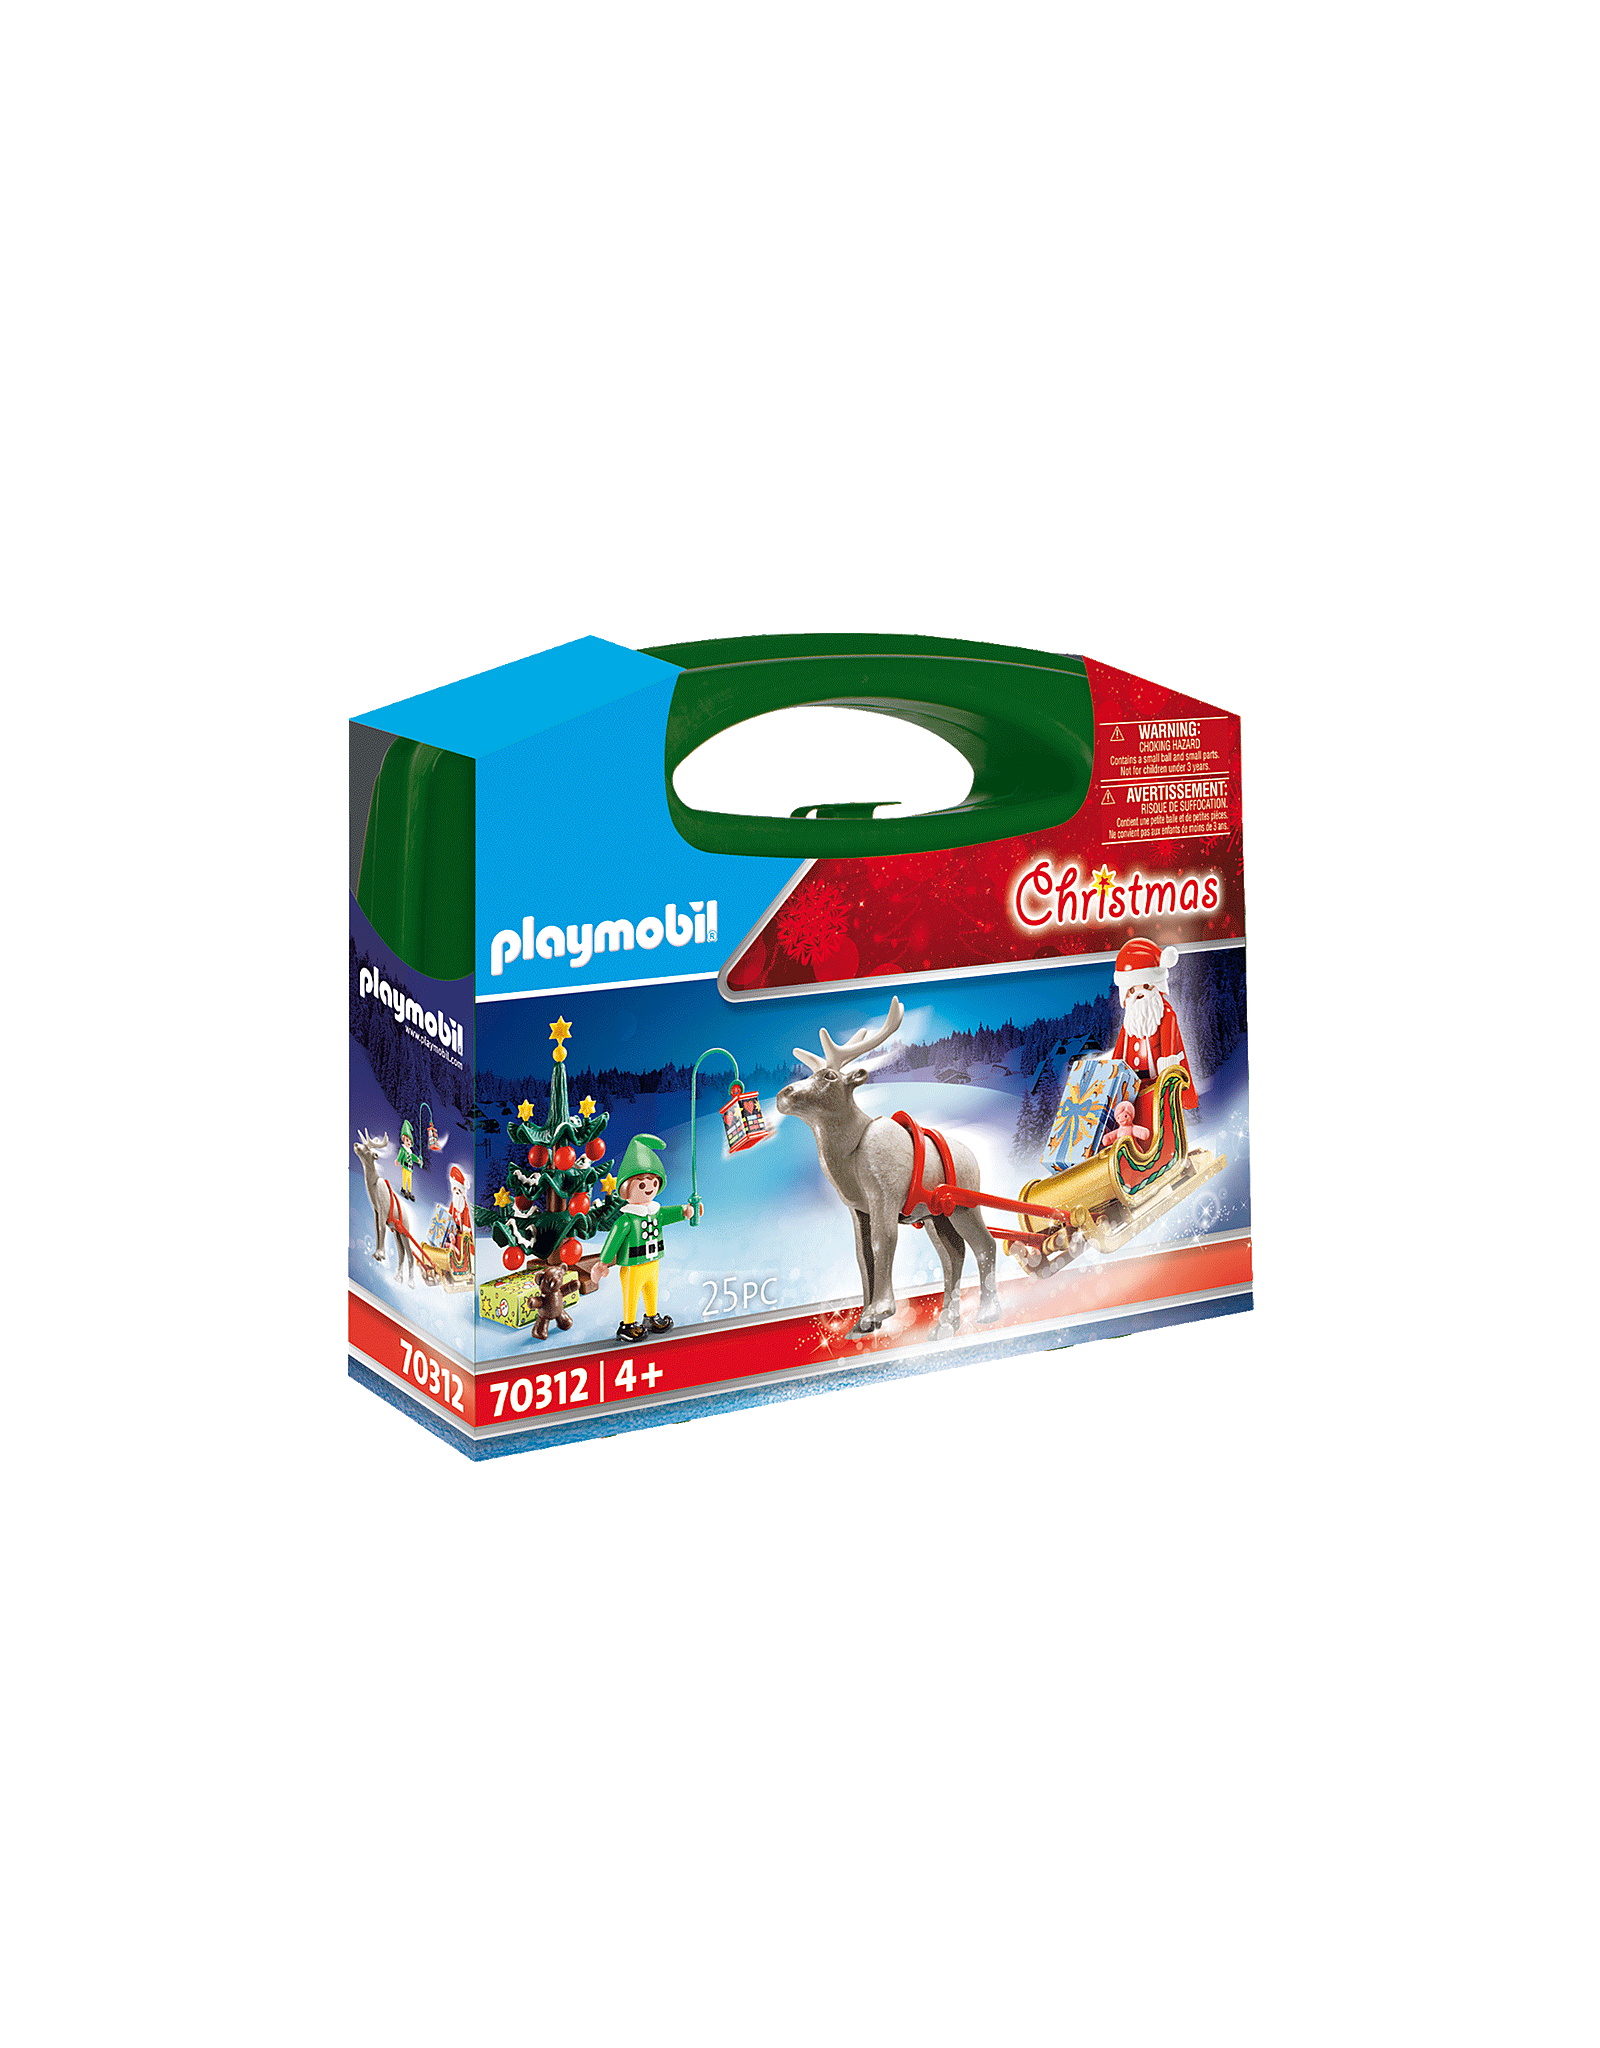 PLAYMOBIL Christmas Carry Case